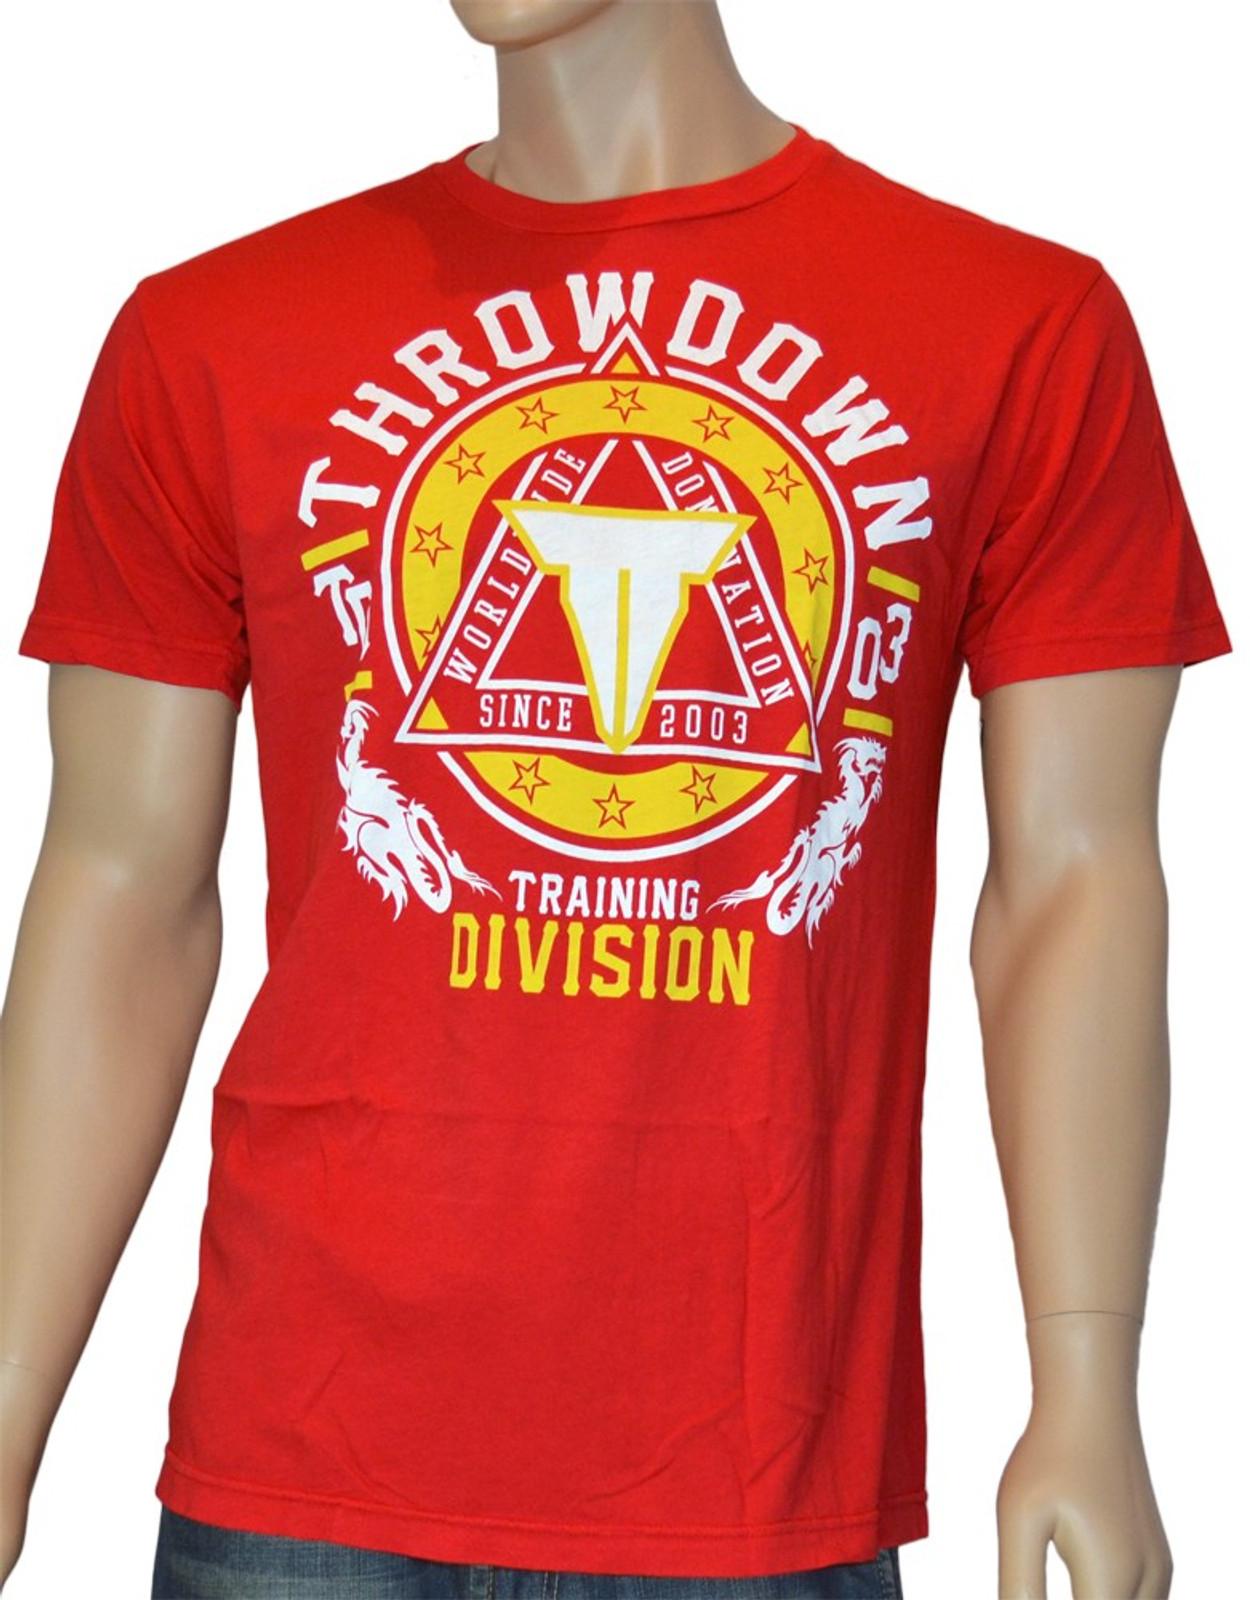 Throwdown Herren T-Shirt Avenge in Rot